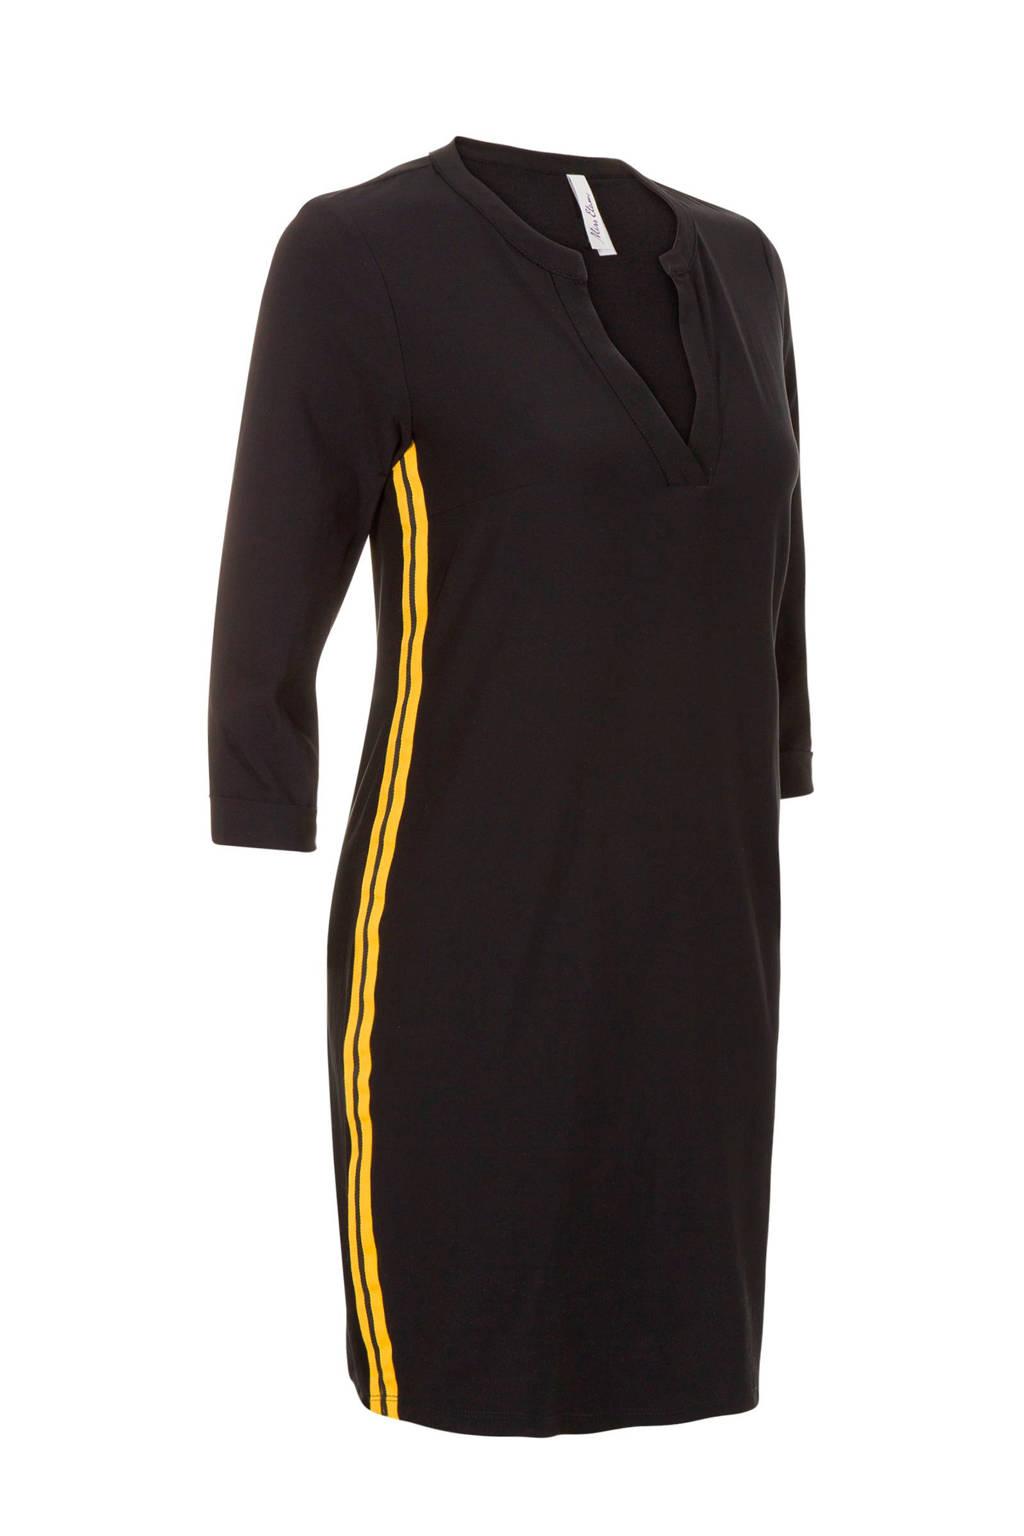 Miss Etam Regulier jurk van travel kwaliteit, Zwart/geel